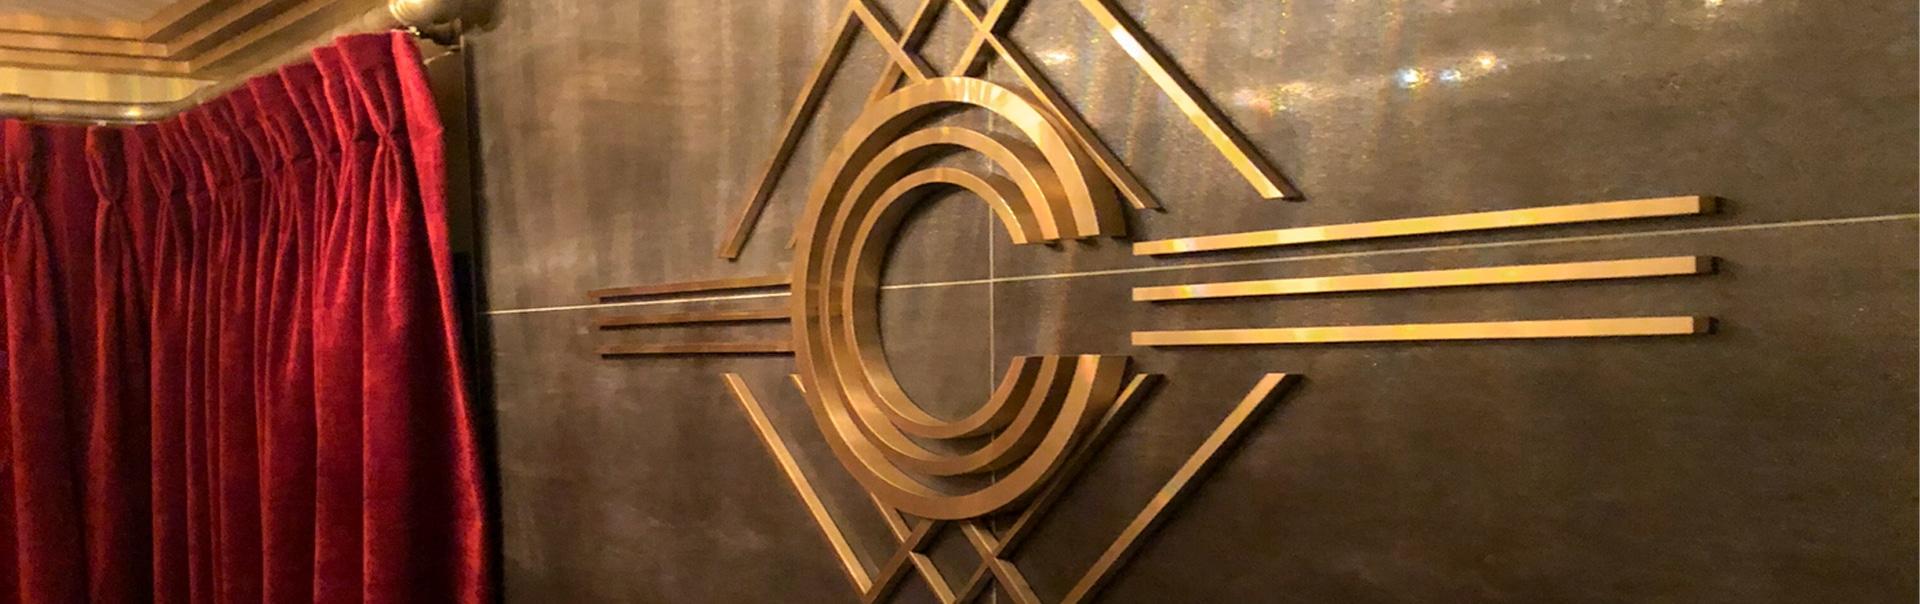 Brass wall logo at Dublin's Carlton Casino Club